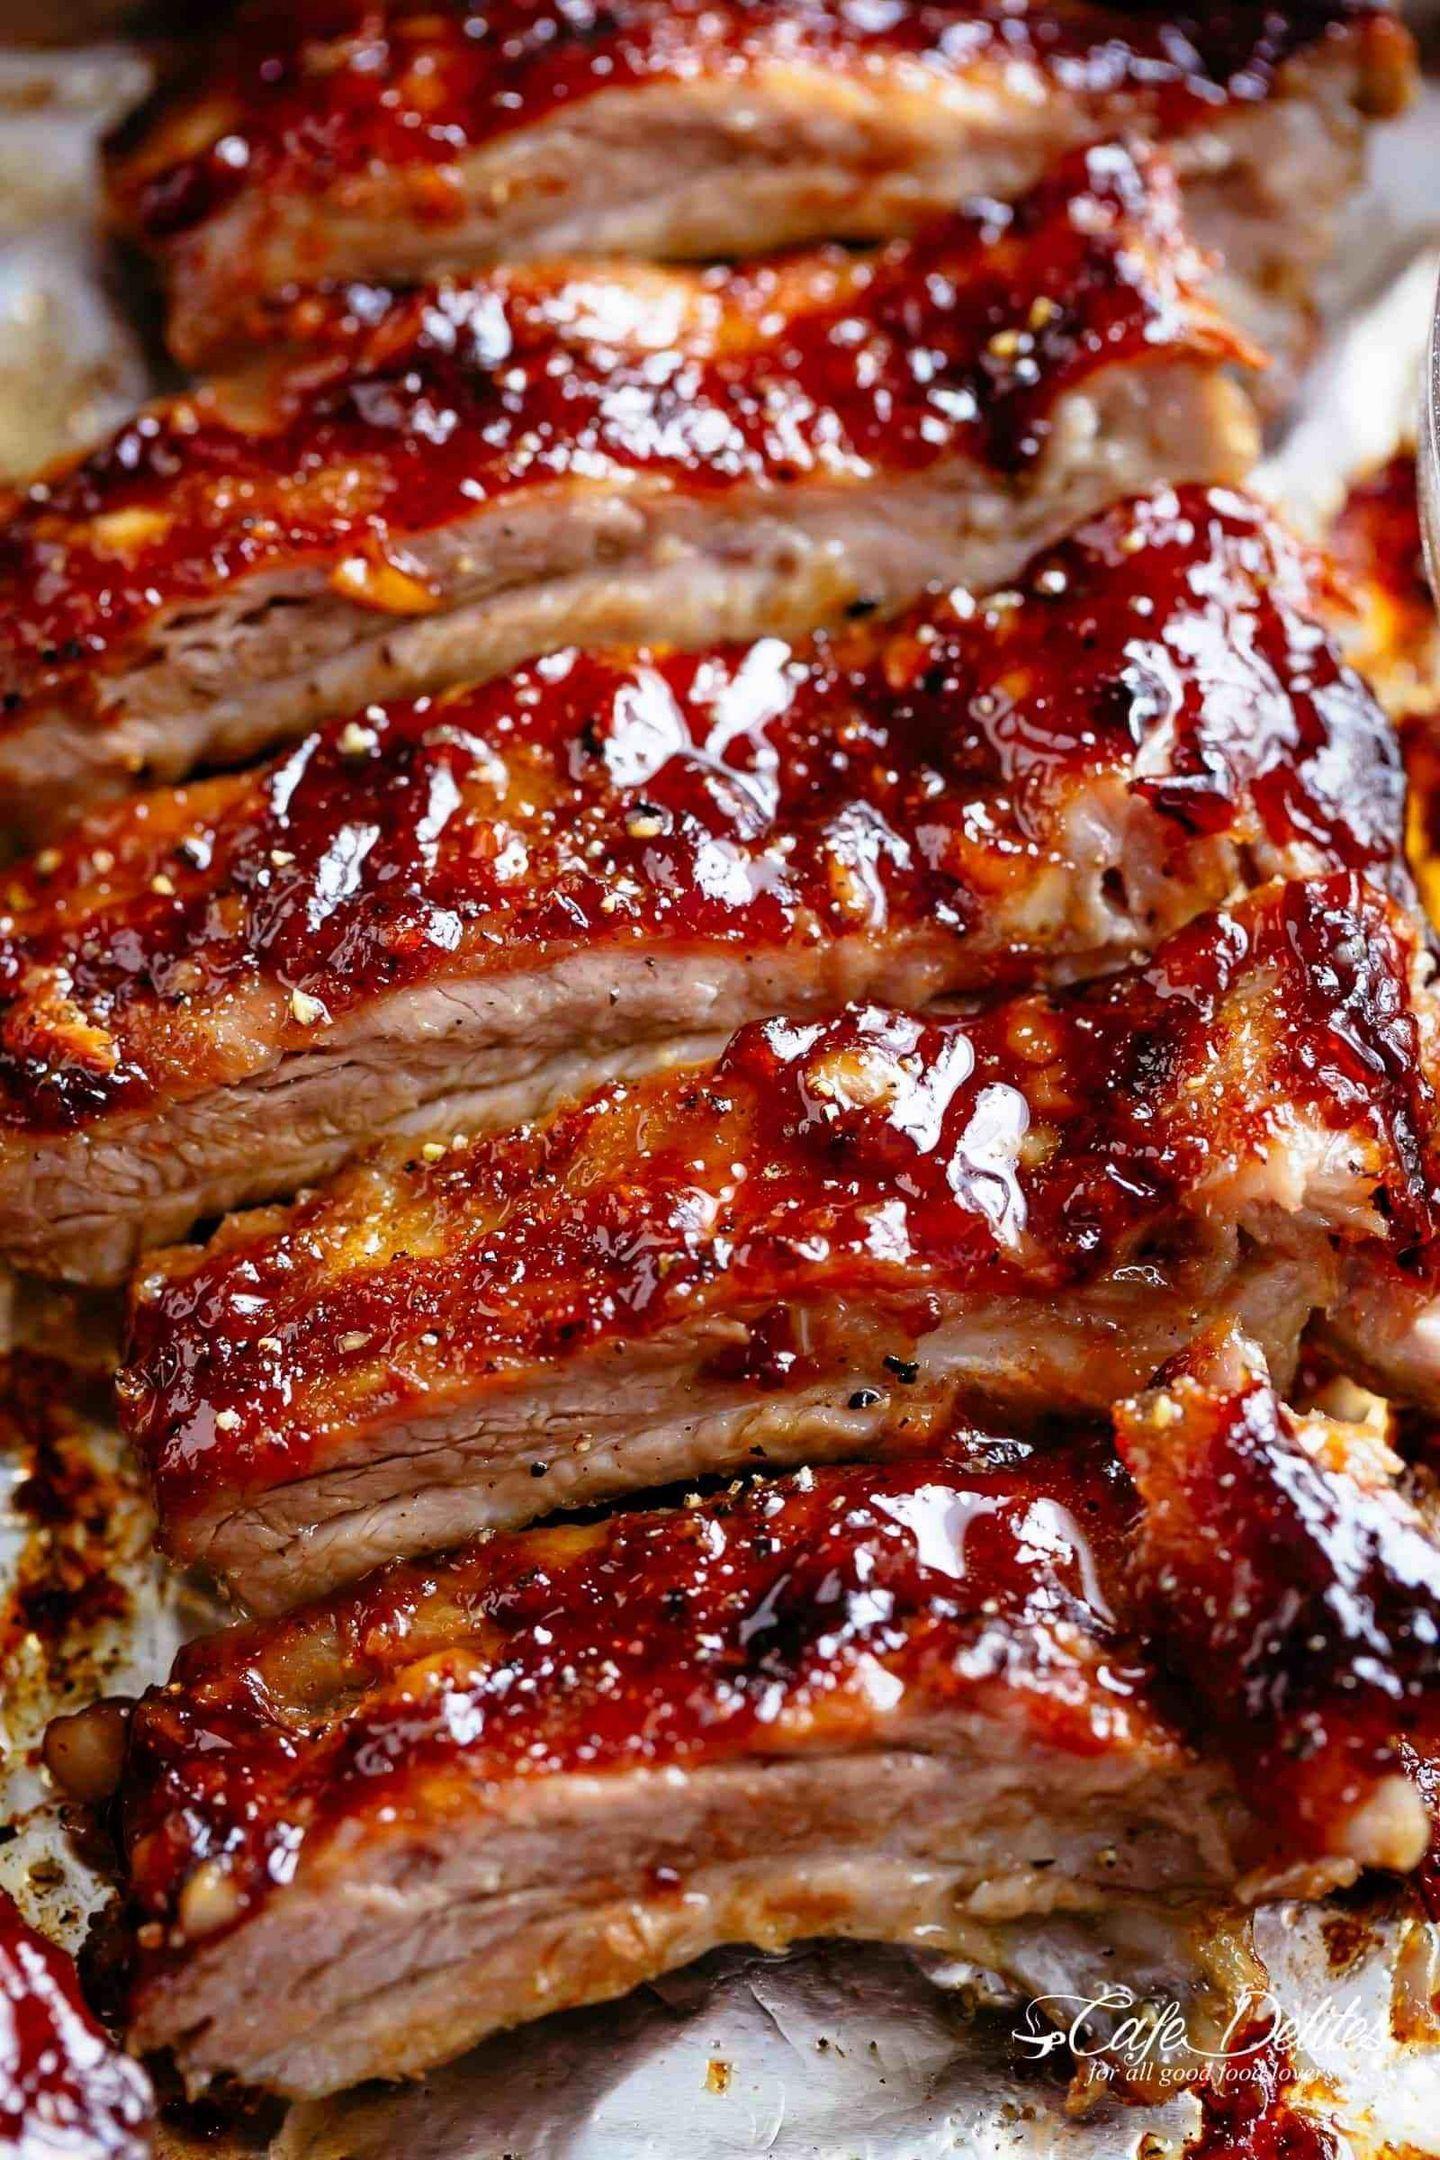 Roadhouse Ribs Recipe 173 Baked Pork Ribs Barbecue Pork Ribs Rib Recipes